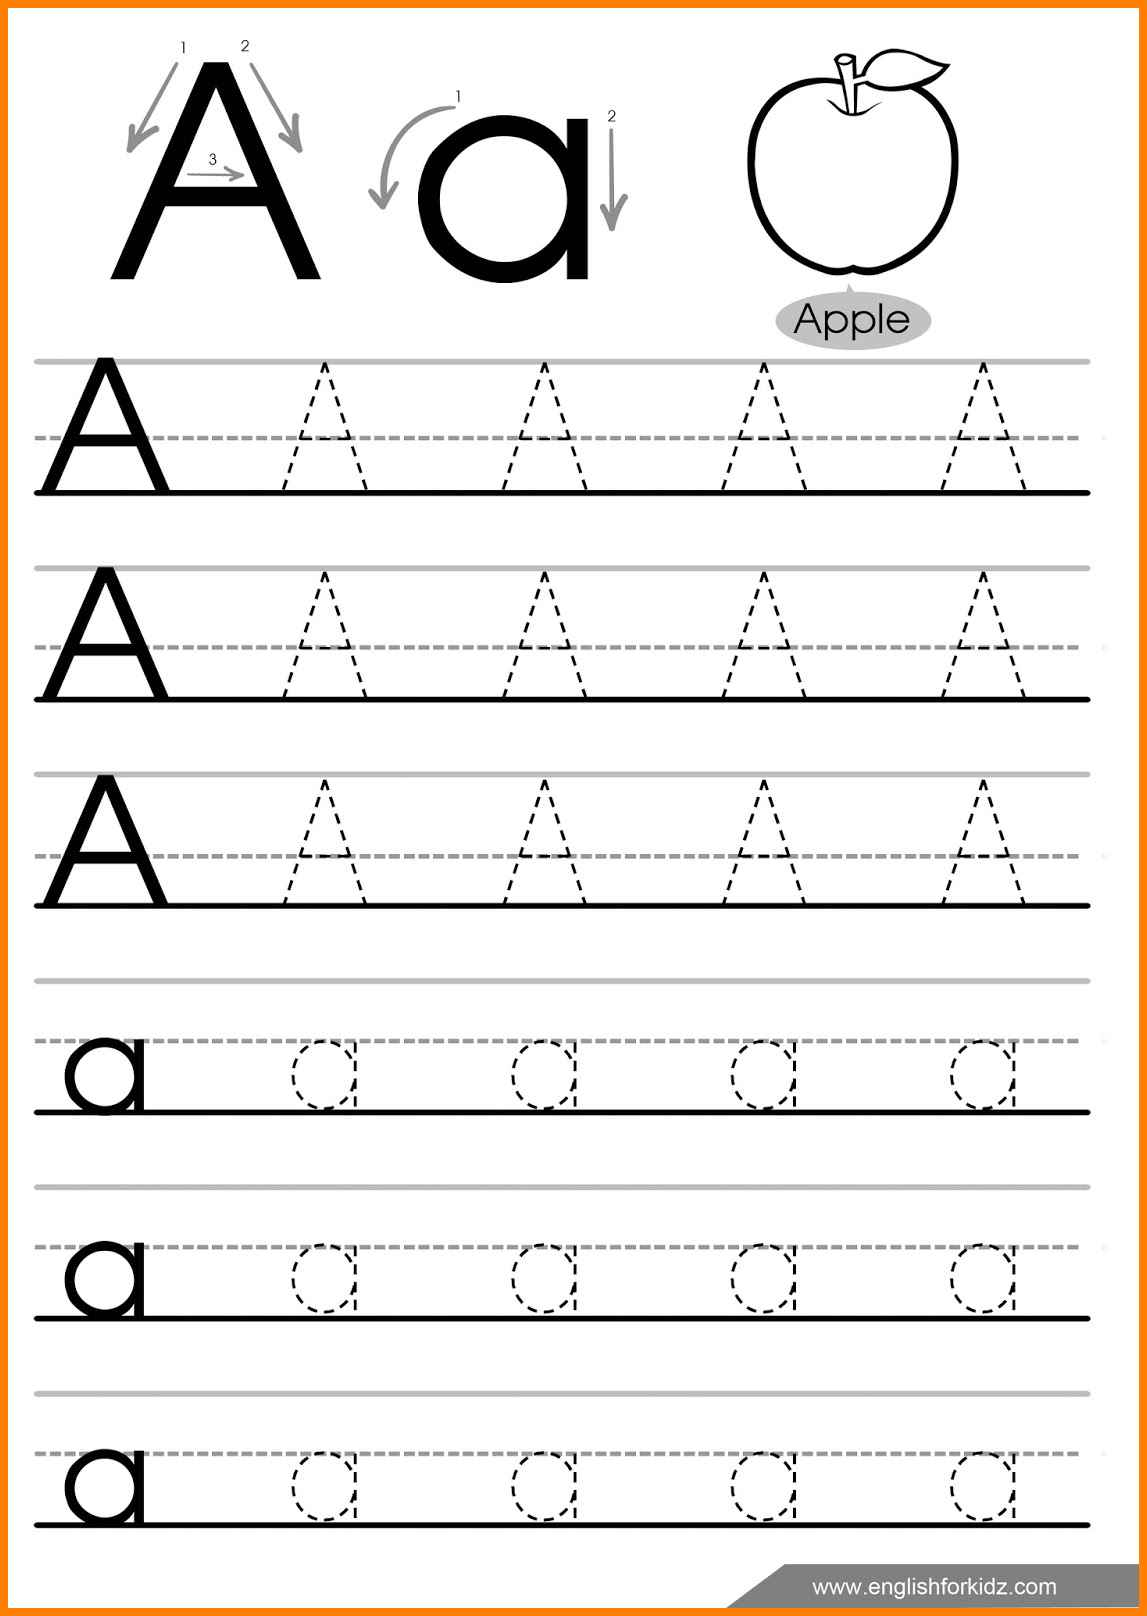 7 Letter Tracing Worksheets